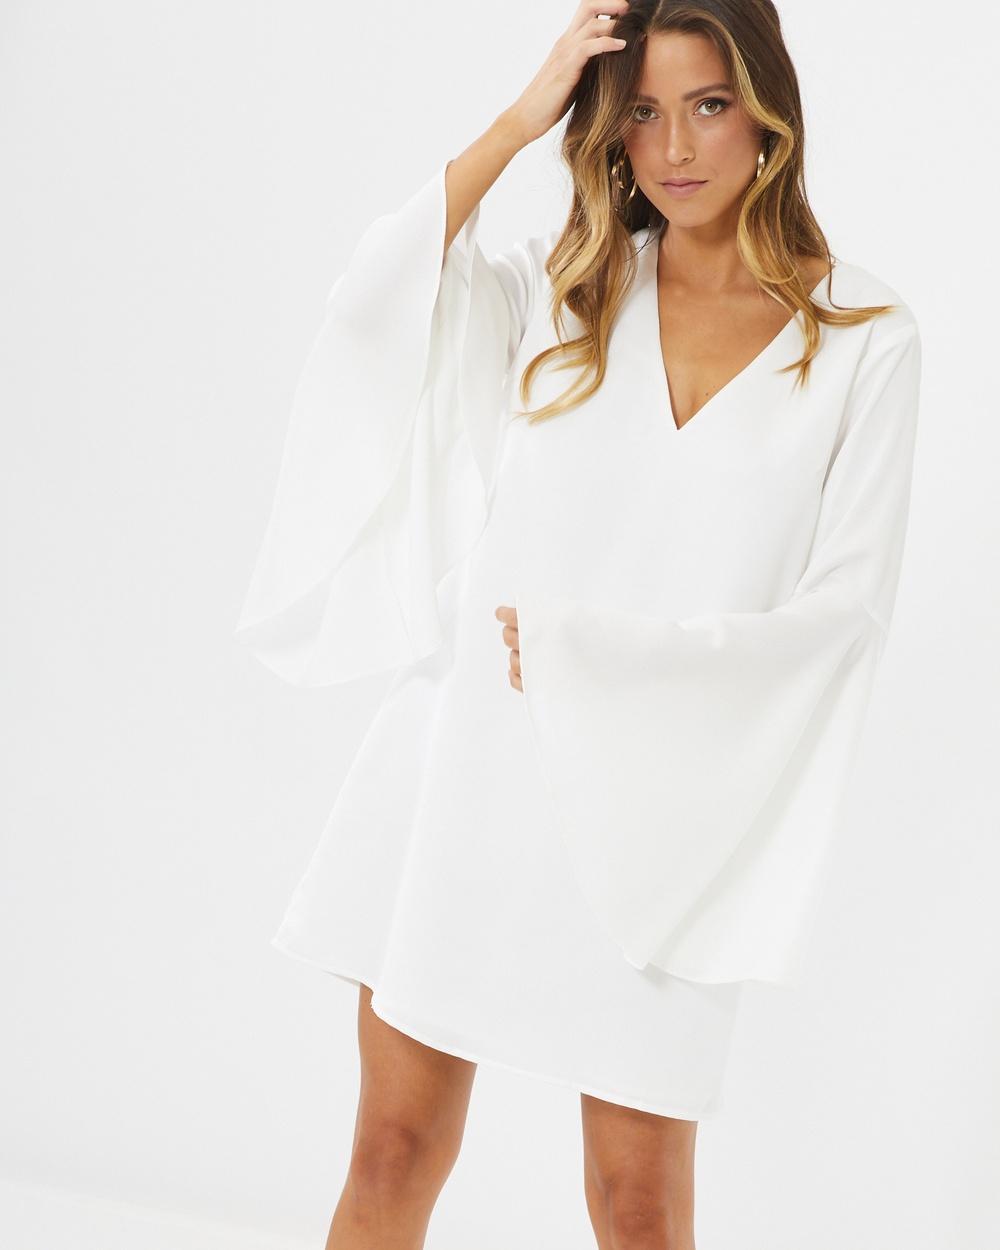 Calli Lea Dress Dresses White Lea Dress